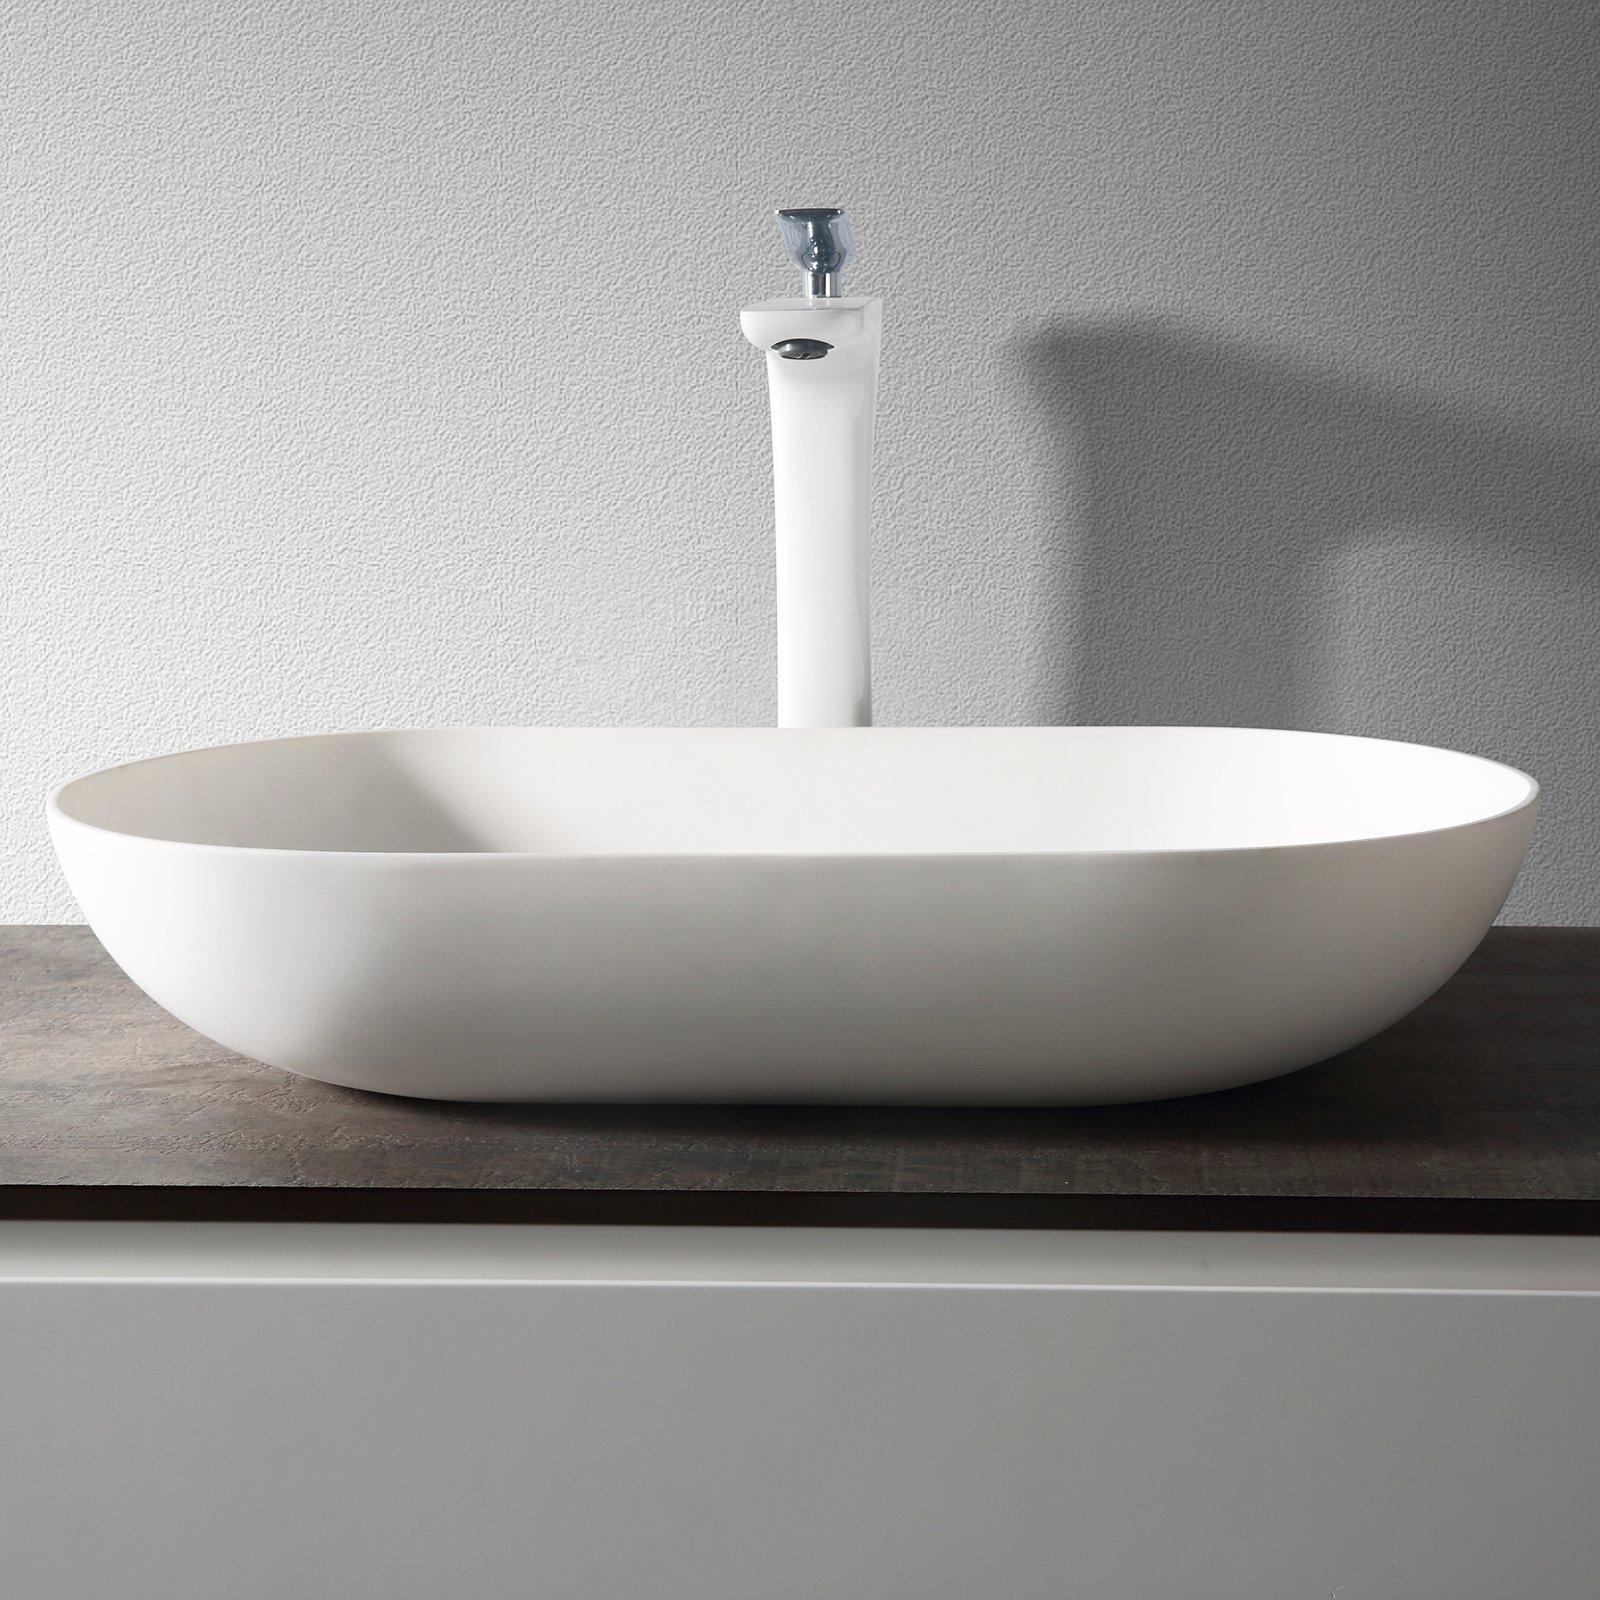 Aufsatzwaschbecken O-540 aus Mineralguss - Weiß matt - 54 x 34 x 10,5 cm zoom thumbnail 3